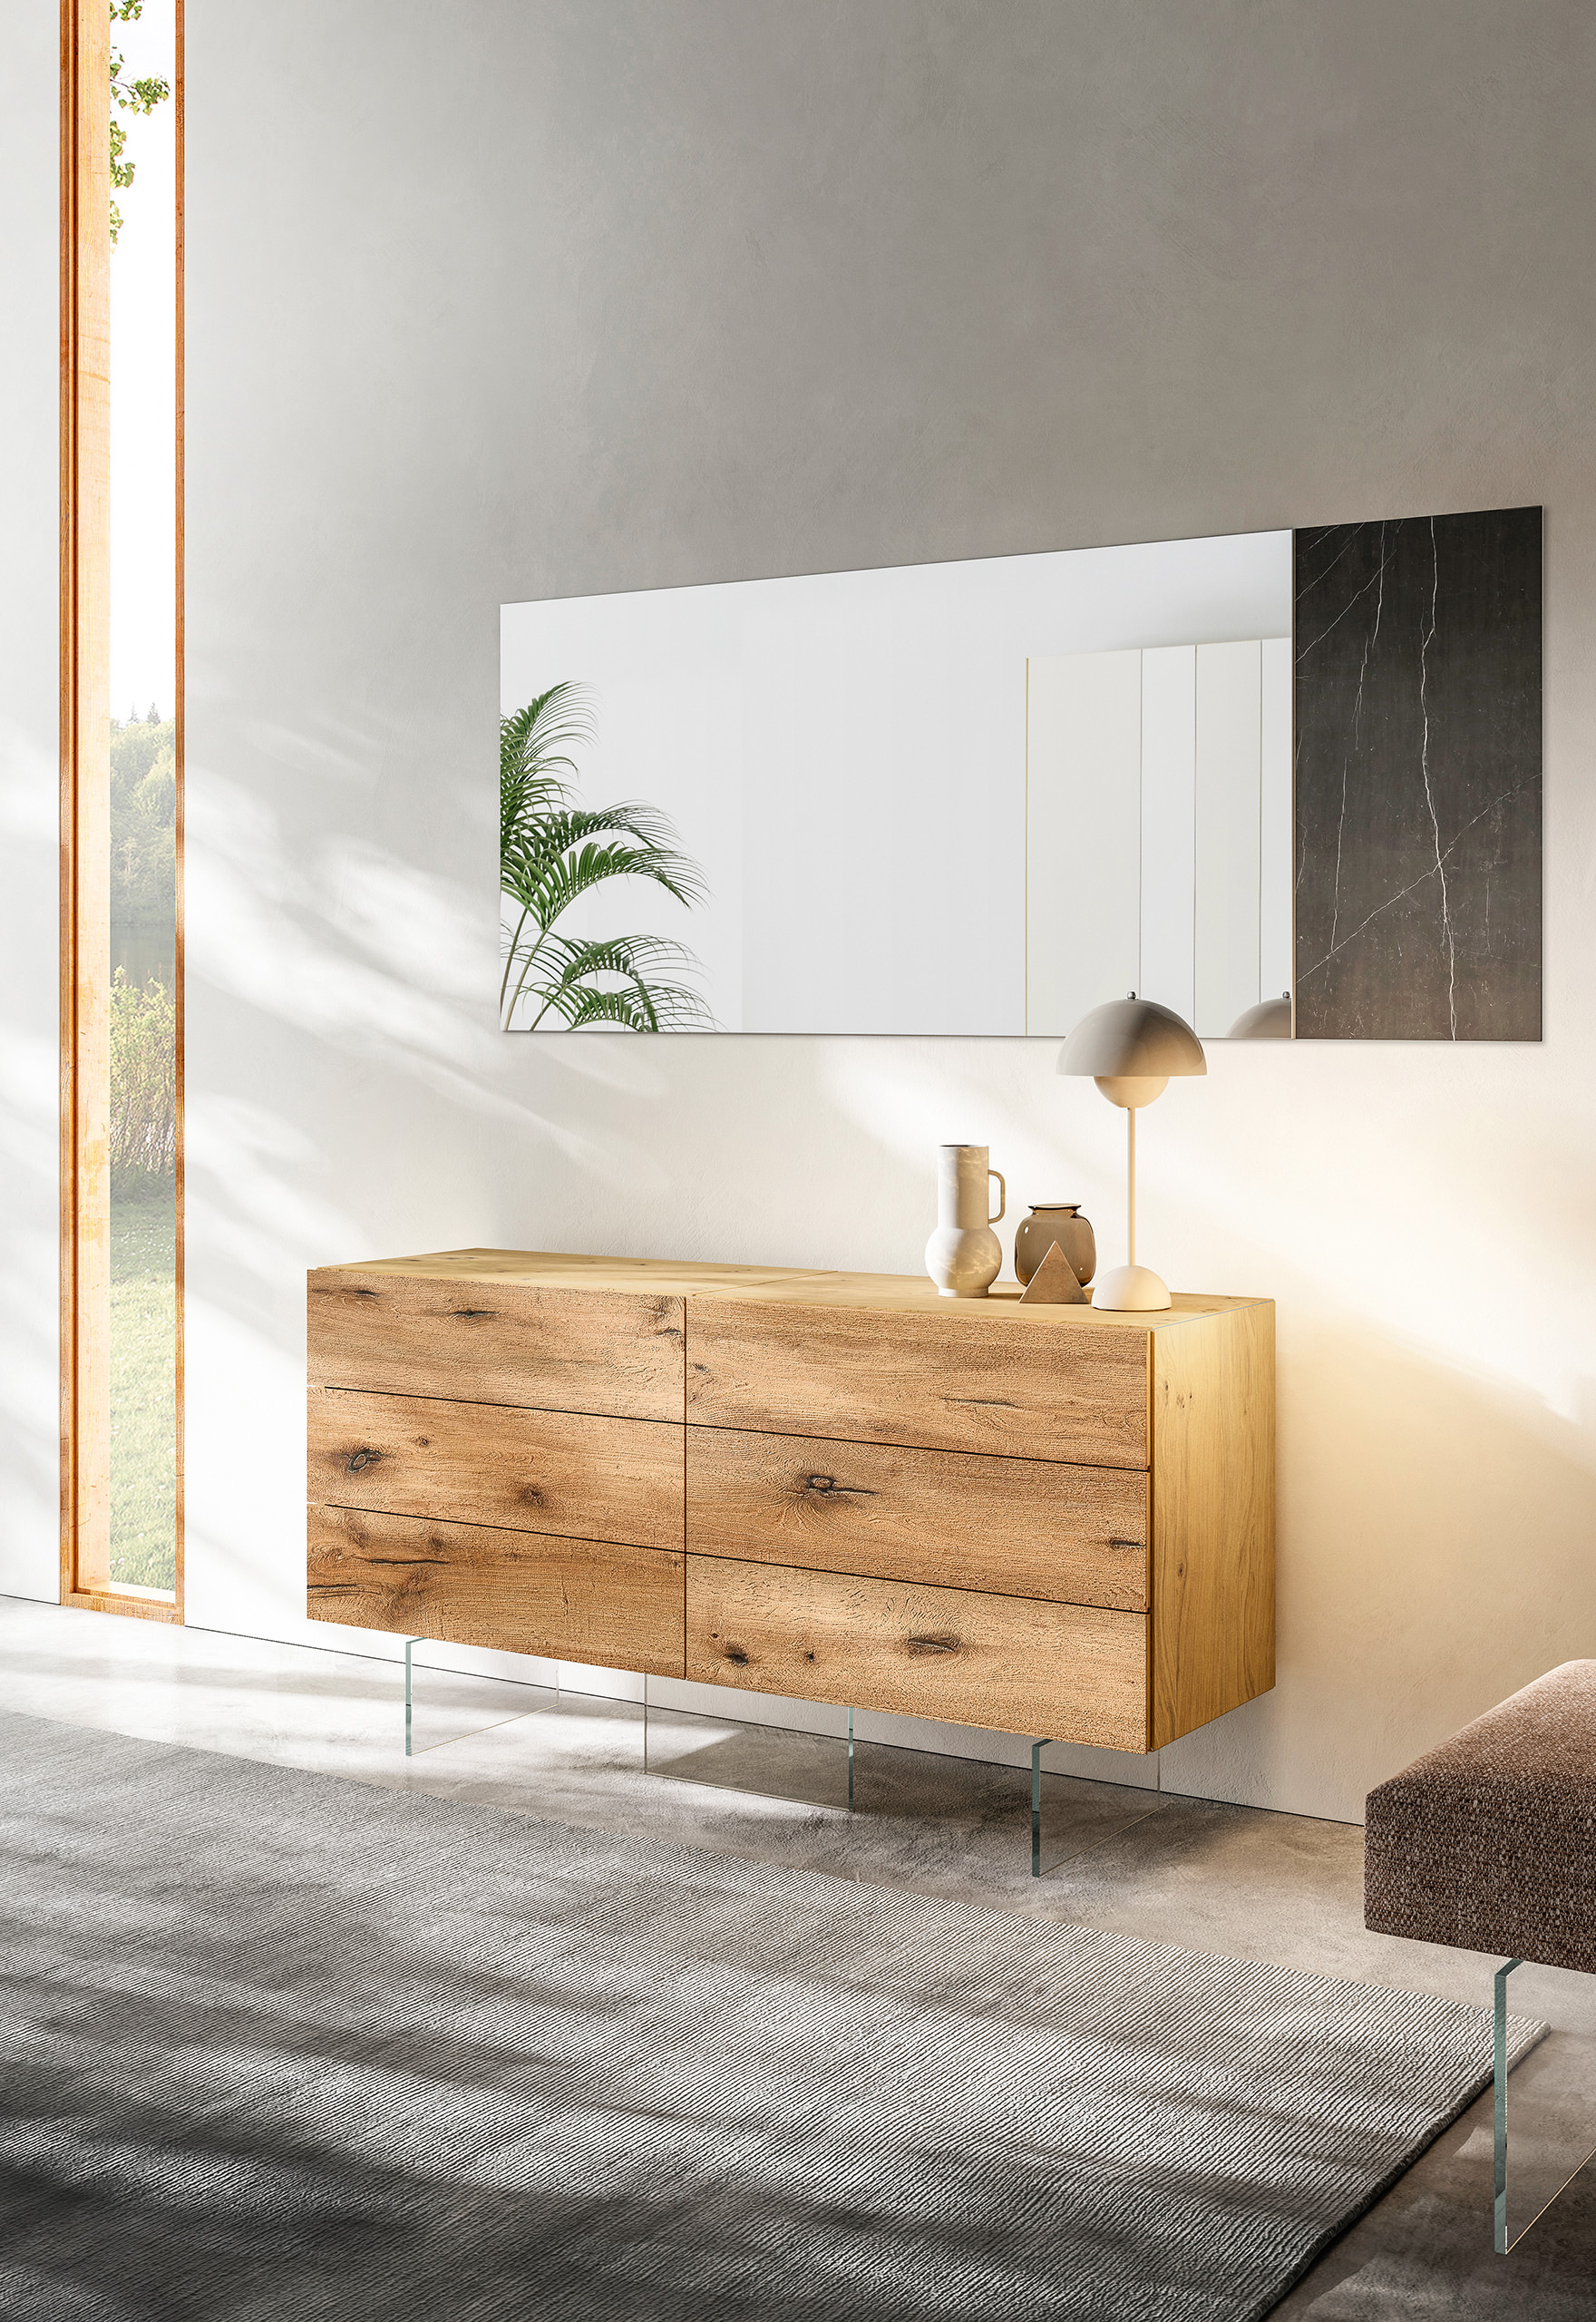 Rendering arredamento camera LAGO madia air legno